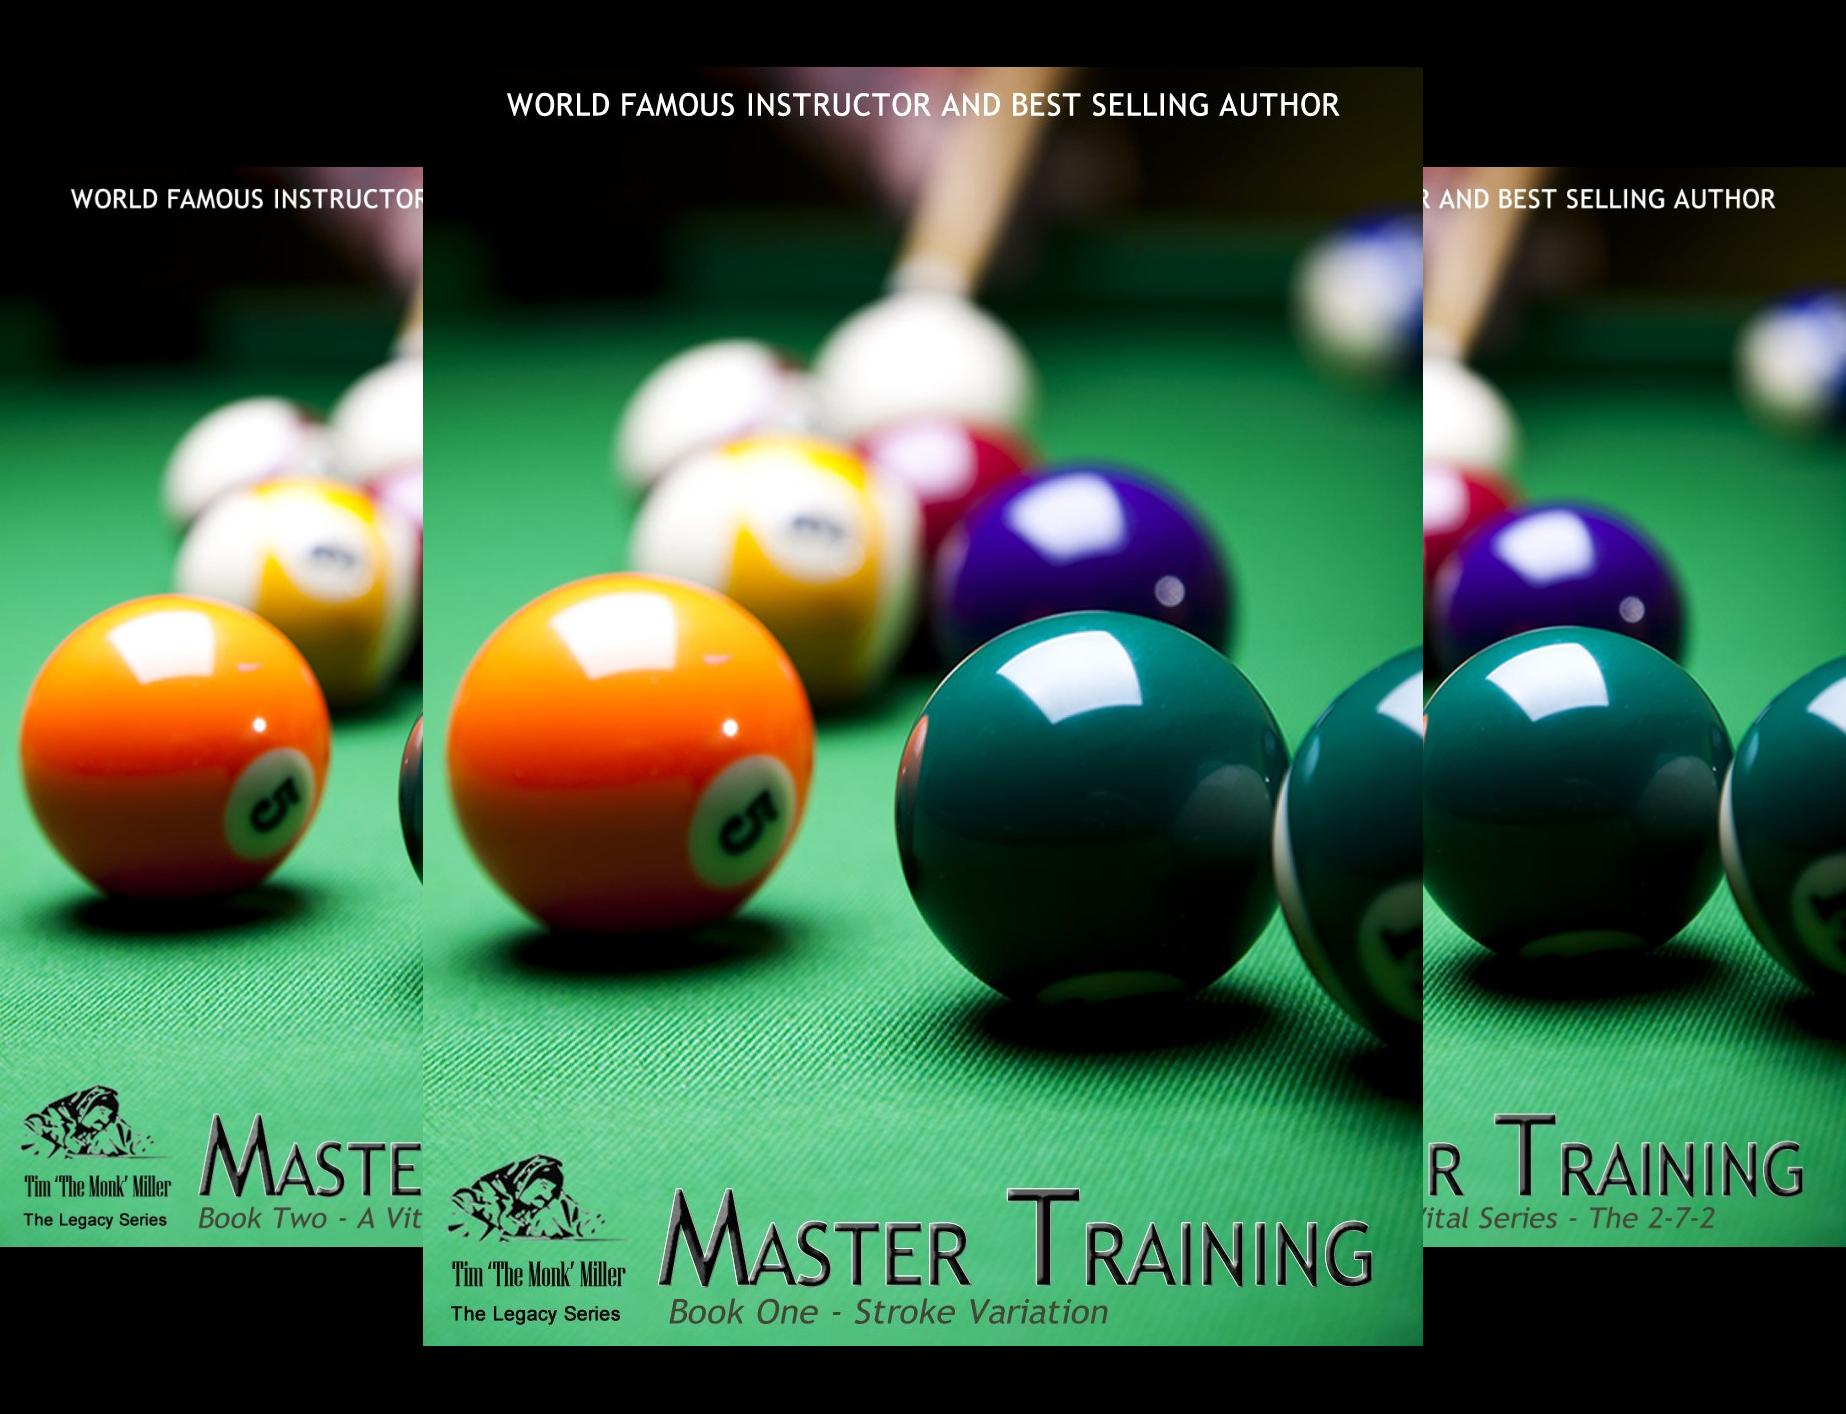 The Monk Billiard Academy Master Training Legacy Series (6 Book Series)